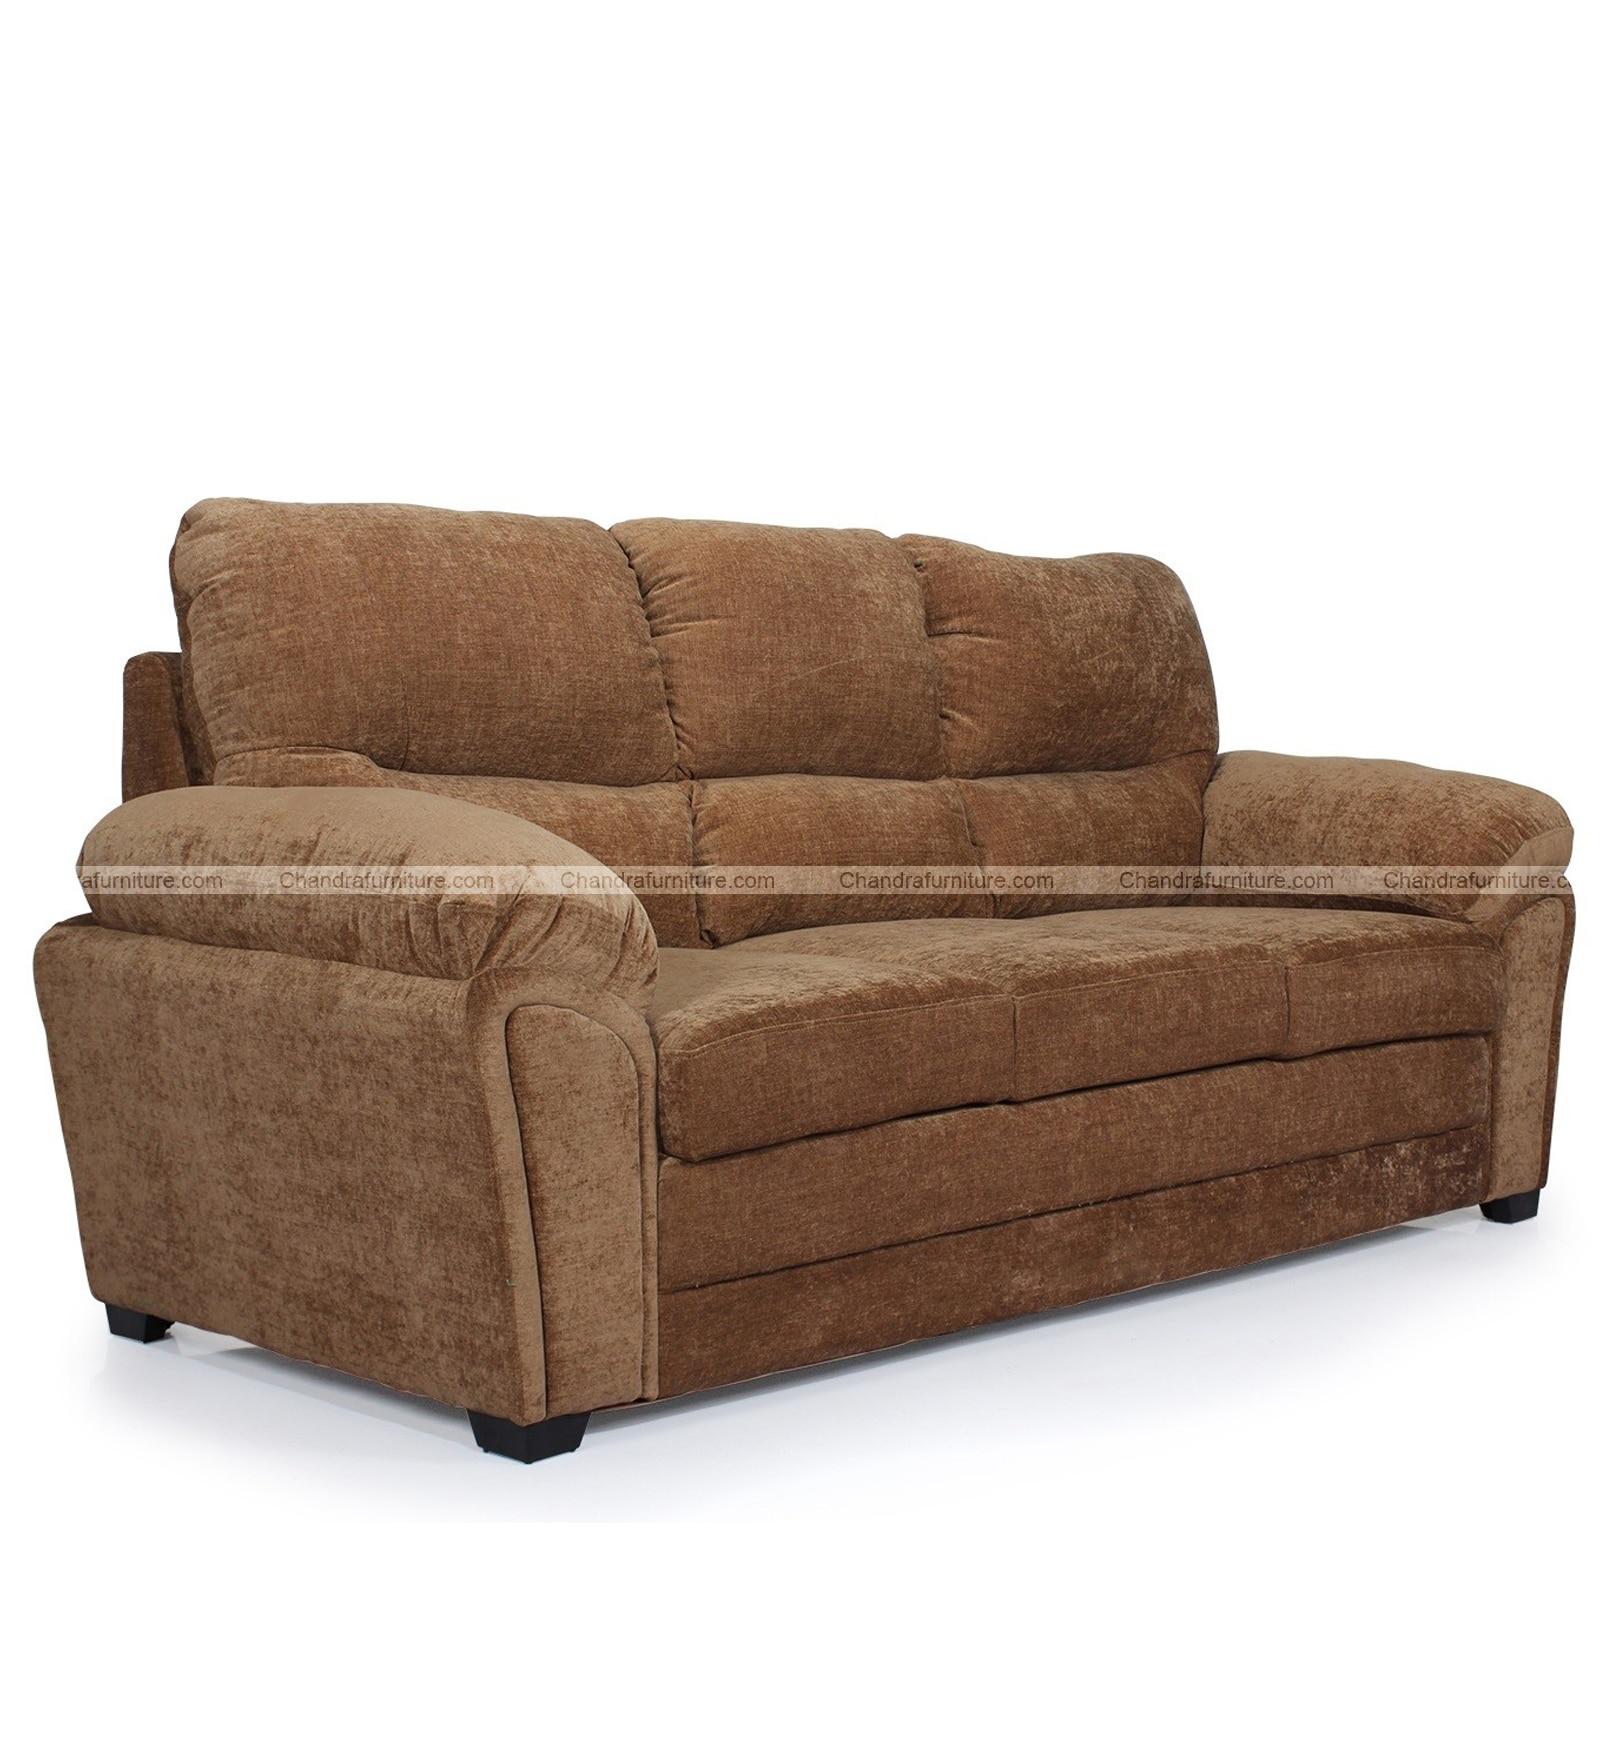 Chandra Furniture Image Sofa Set In Dark Colour Lathrite